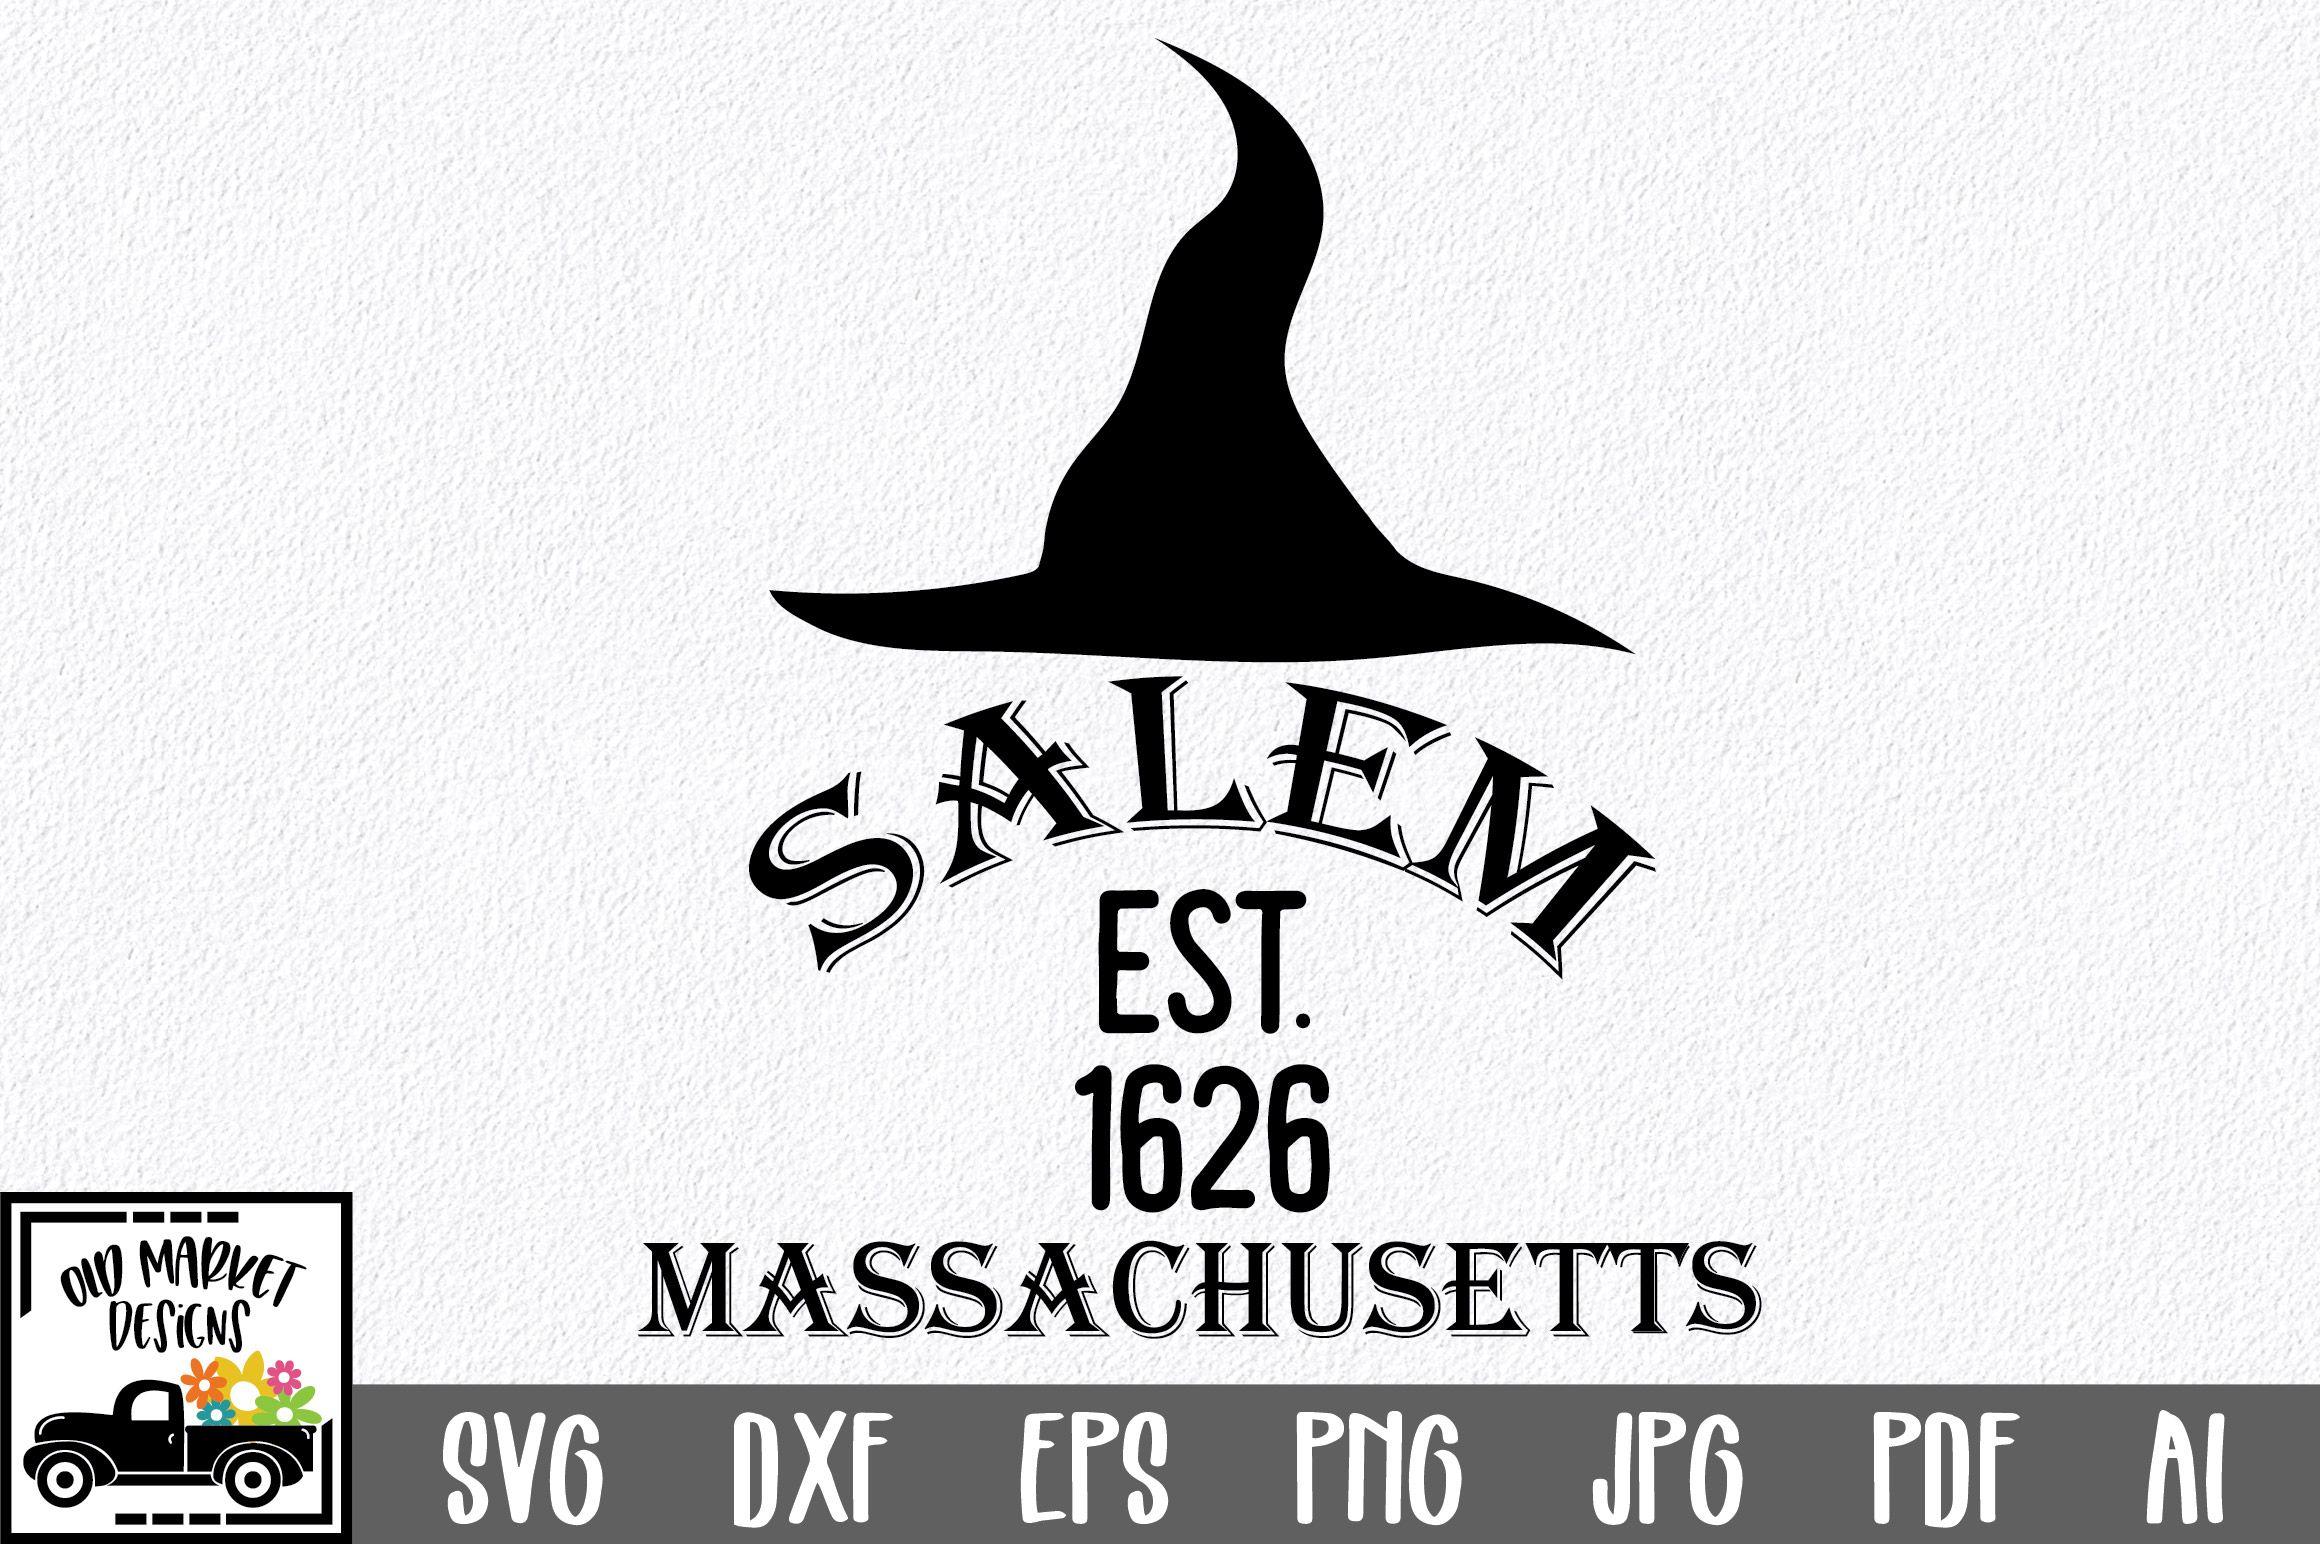 Salem Massachusetts (Graphic) by oldmarketdesigns